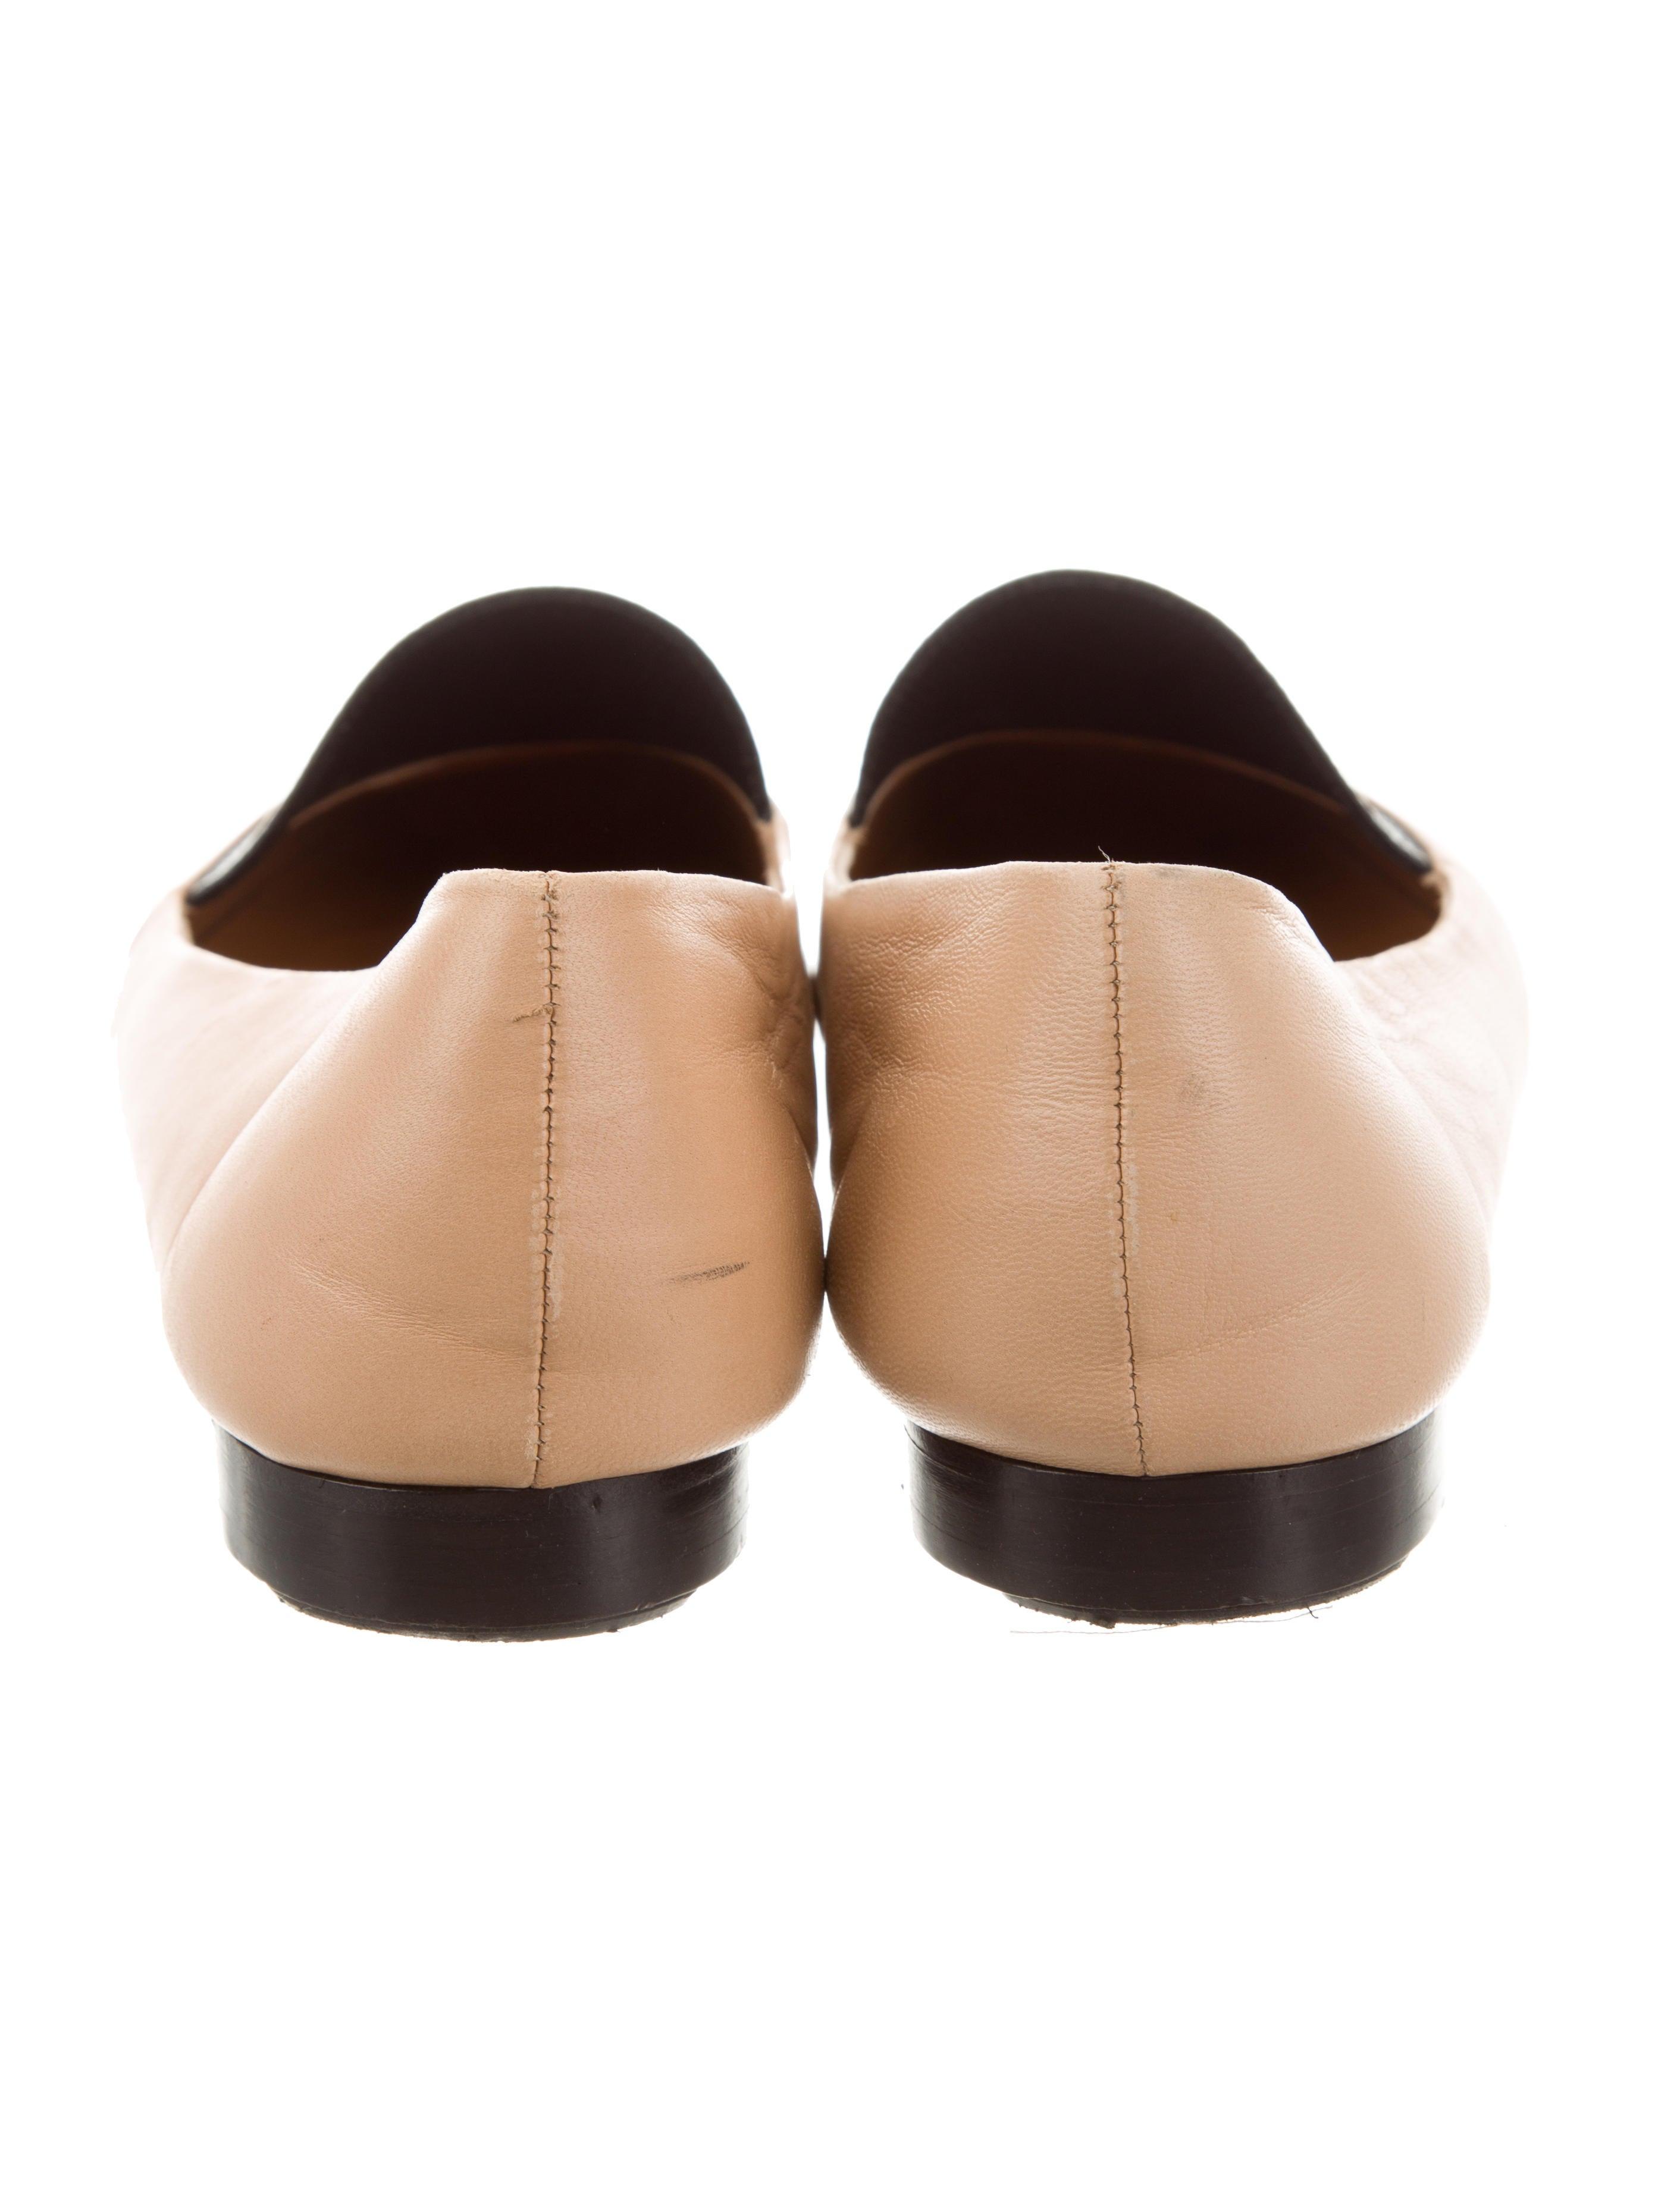 Fendi Bicolor Round-Toe Loafers manchester great sale cheap online discount cost iwFQXYq6L